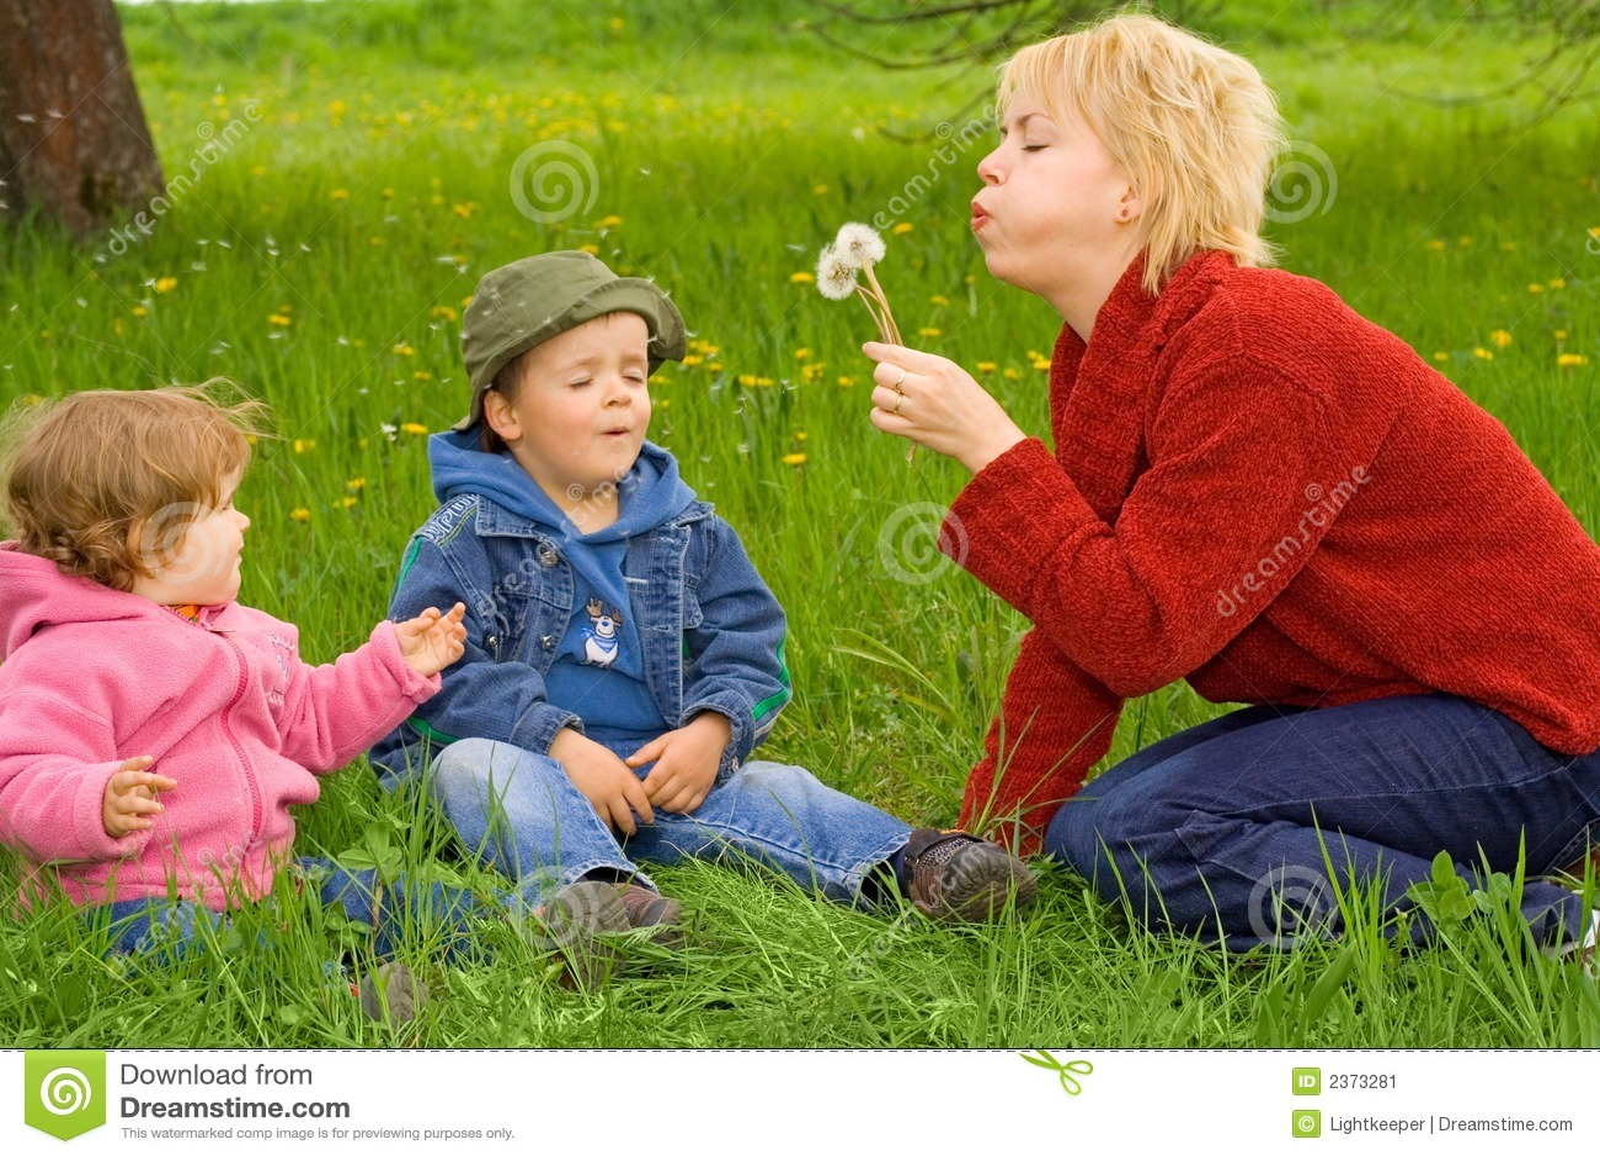 Actividades de la familia al aire libre imagen de archivo - Actividades para ninos al aire libre ...